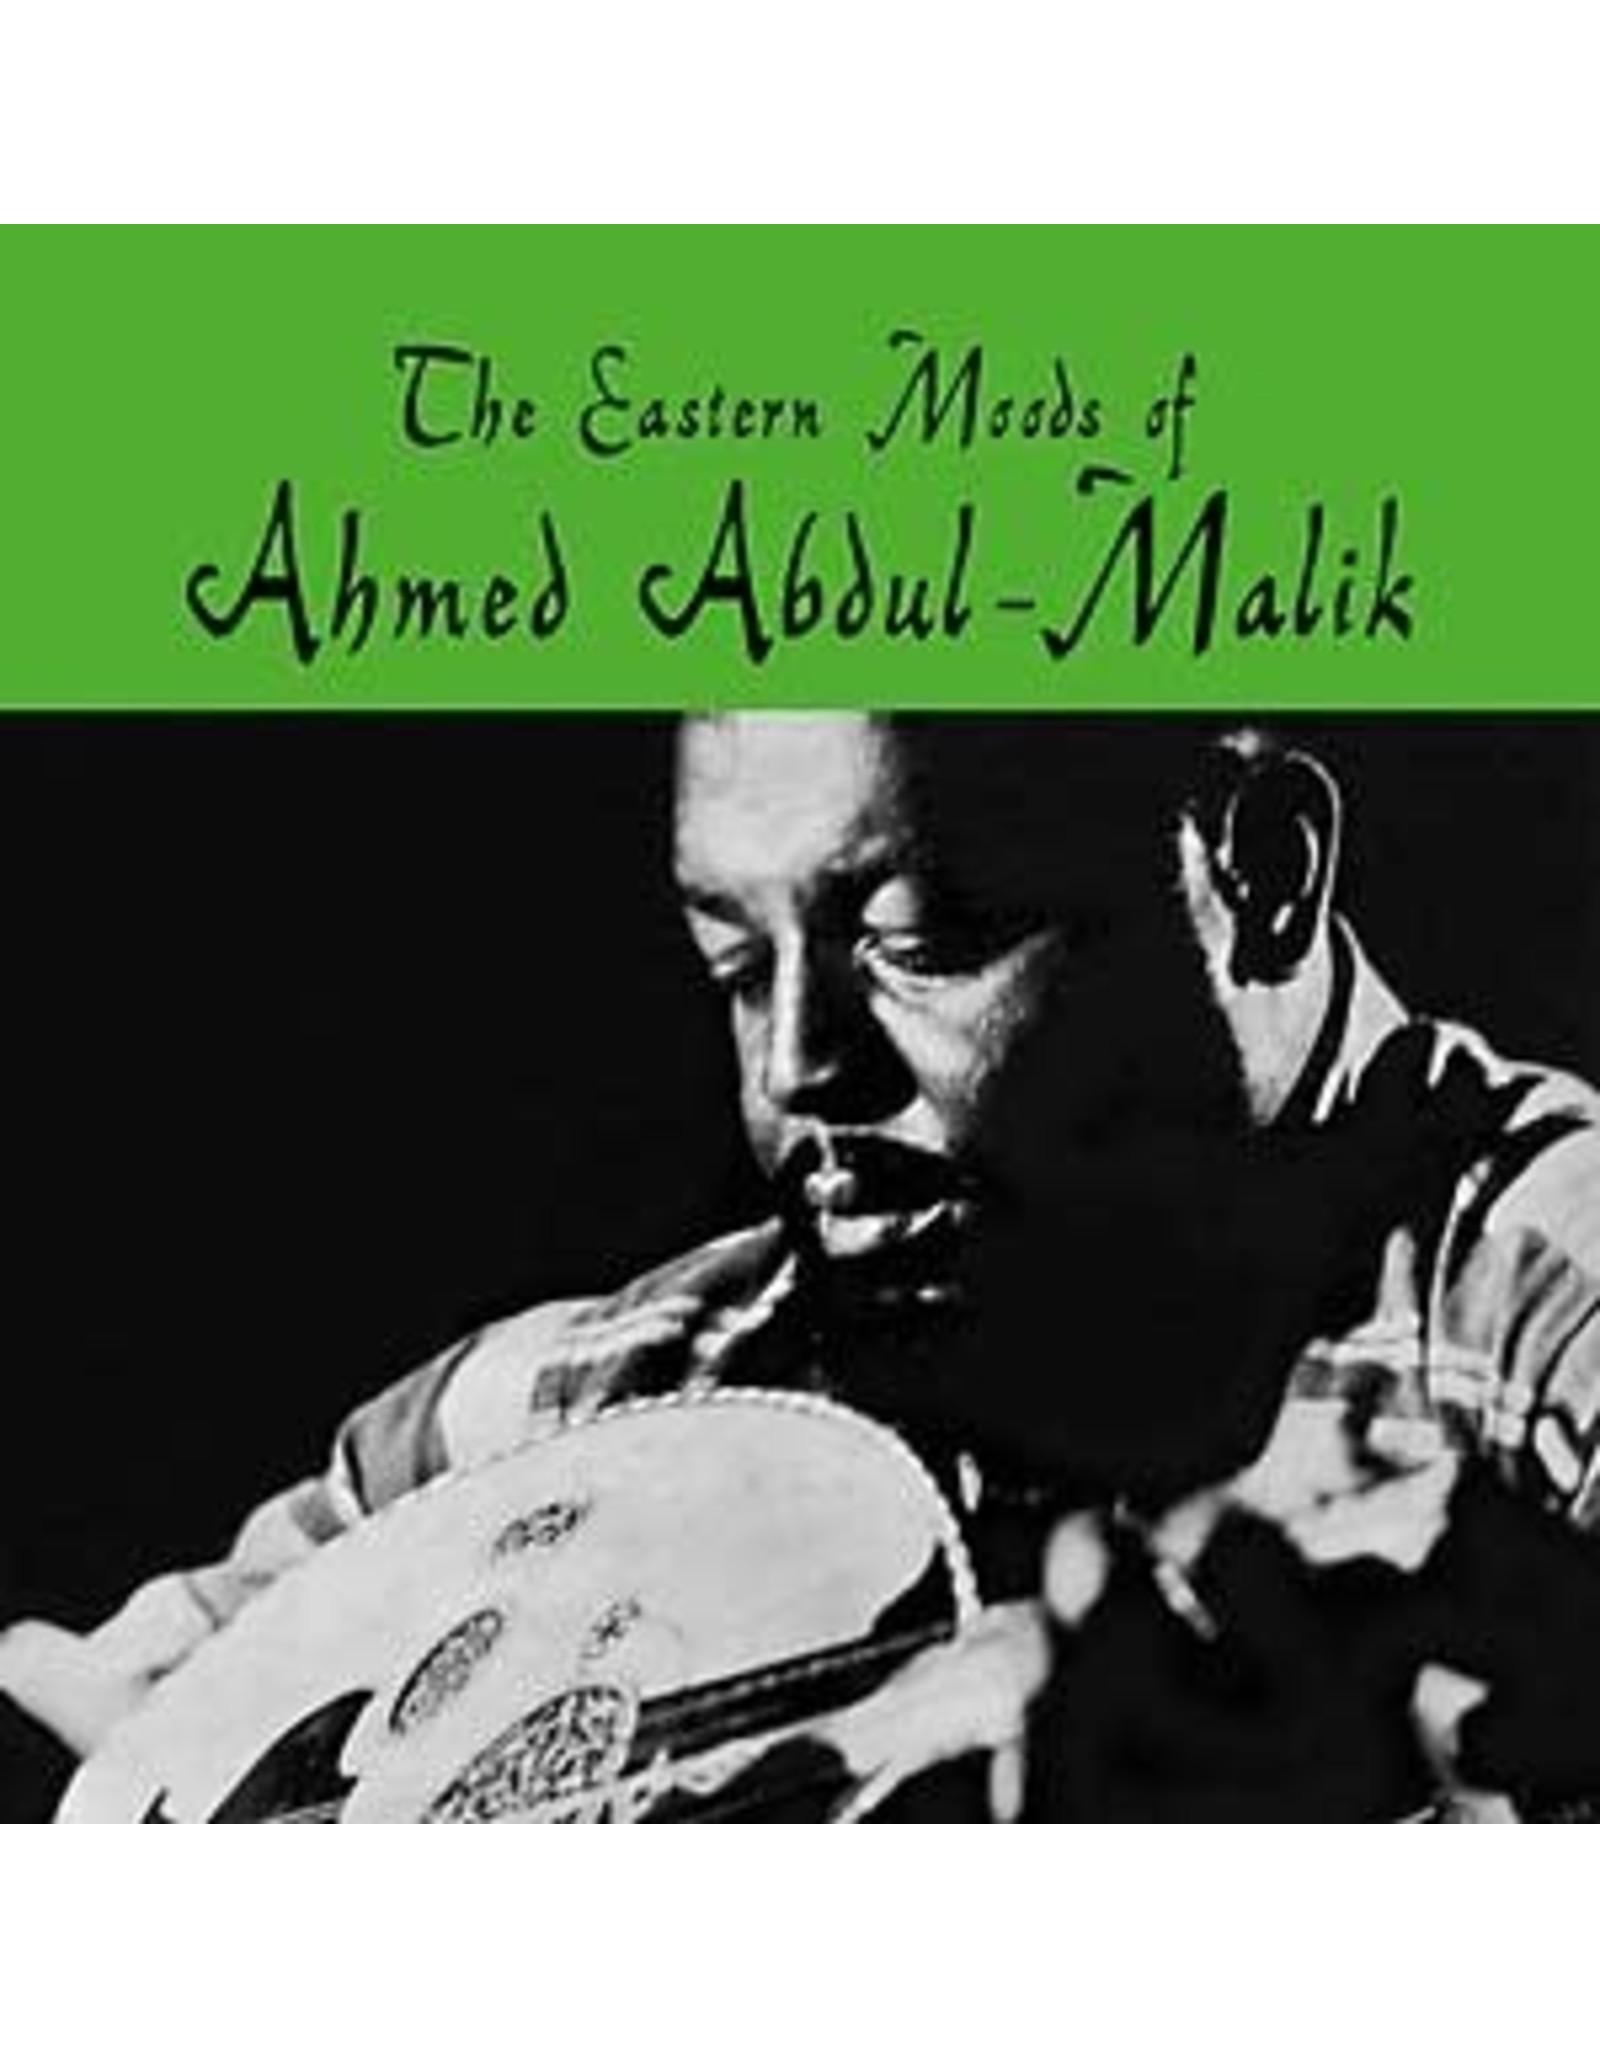 Doxy Abdul-Malik, Ahmed: Eastern Moods of LP